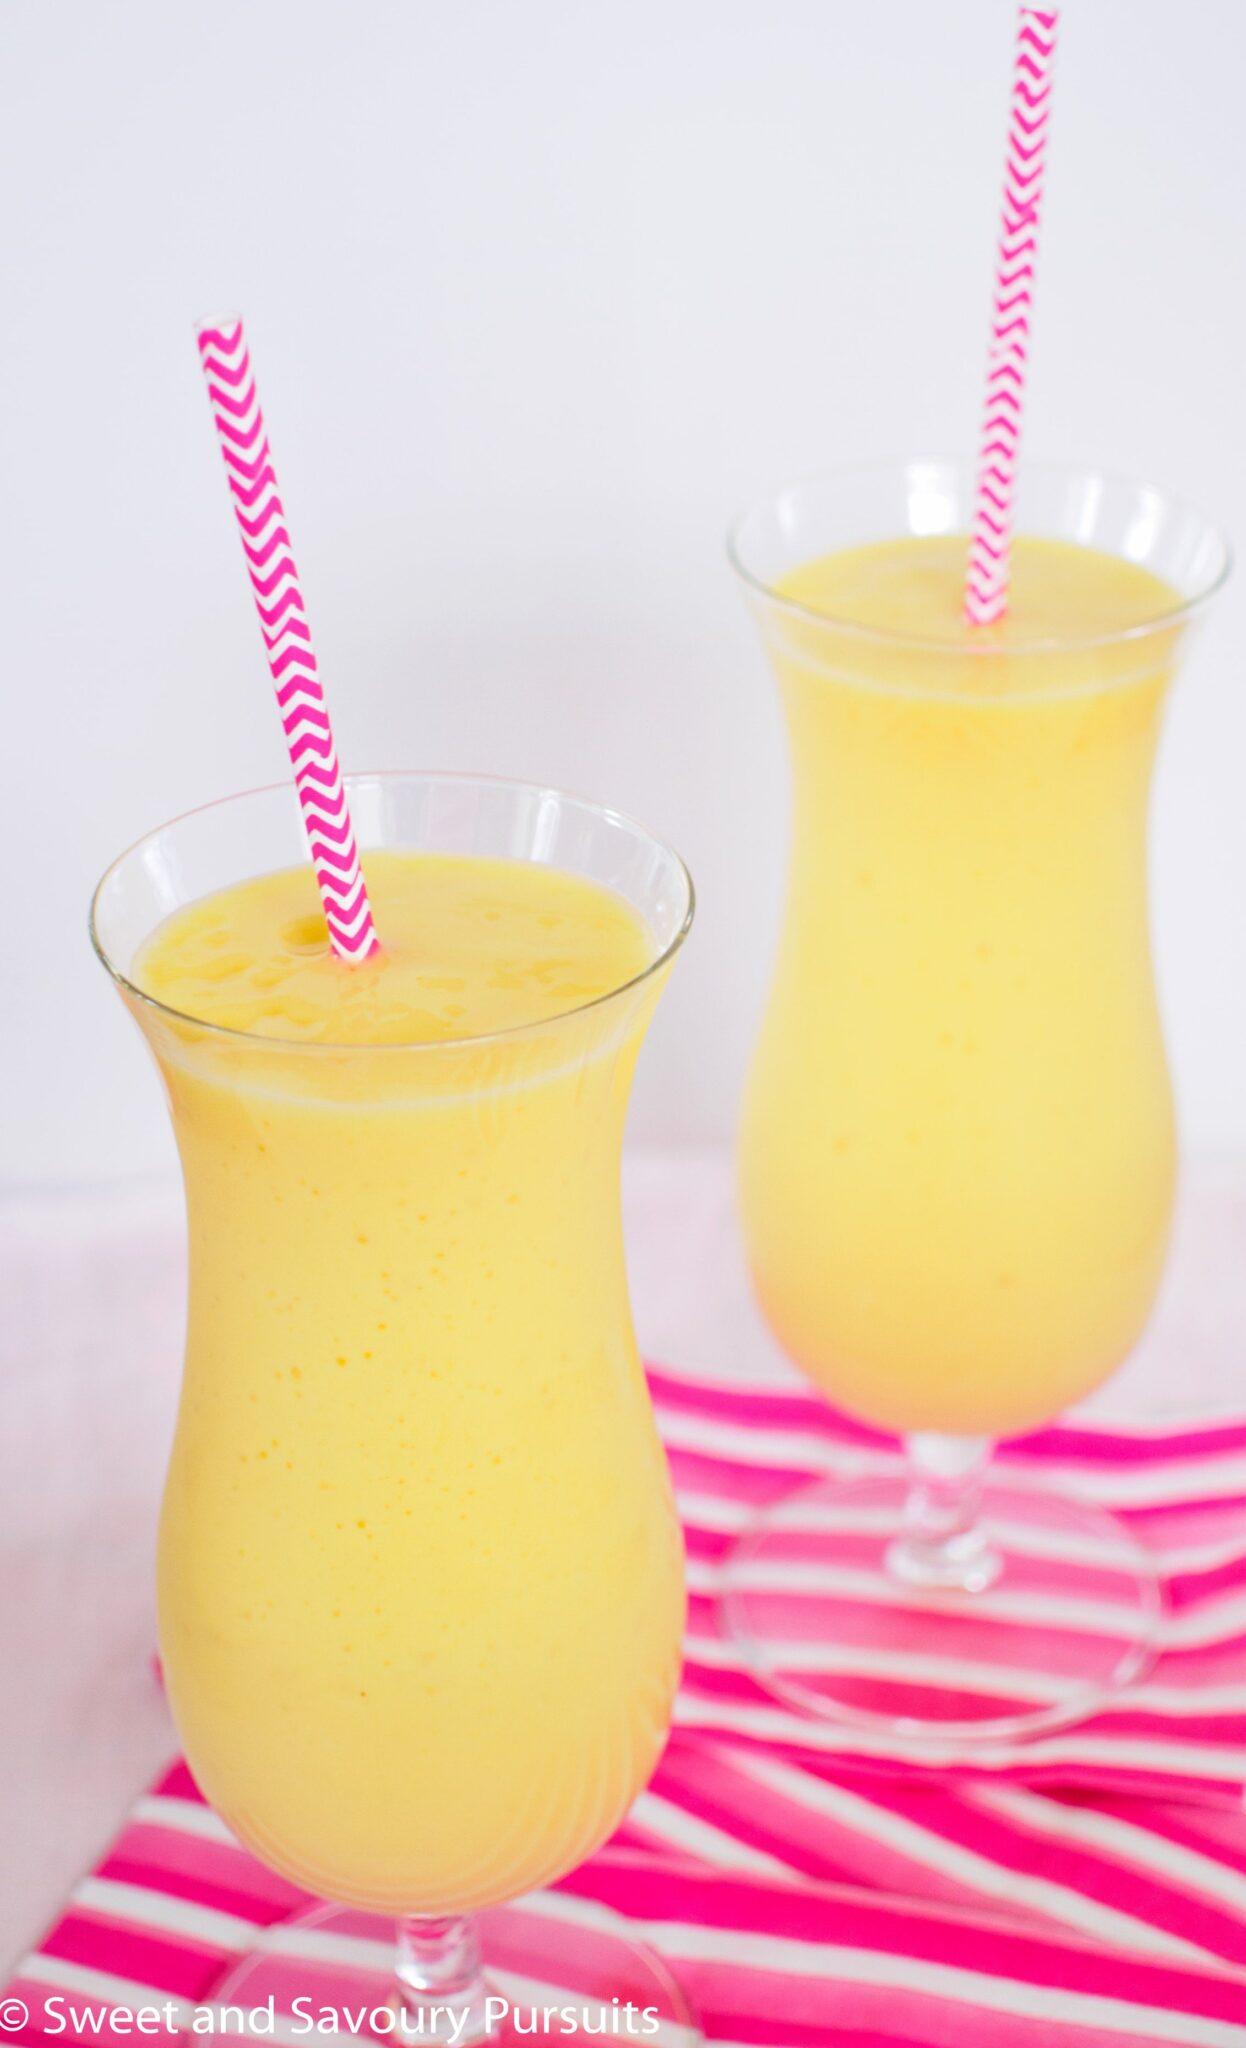 Two Pineapple, Mango and Orange Smoothies.